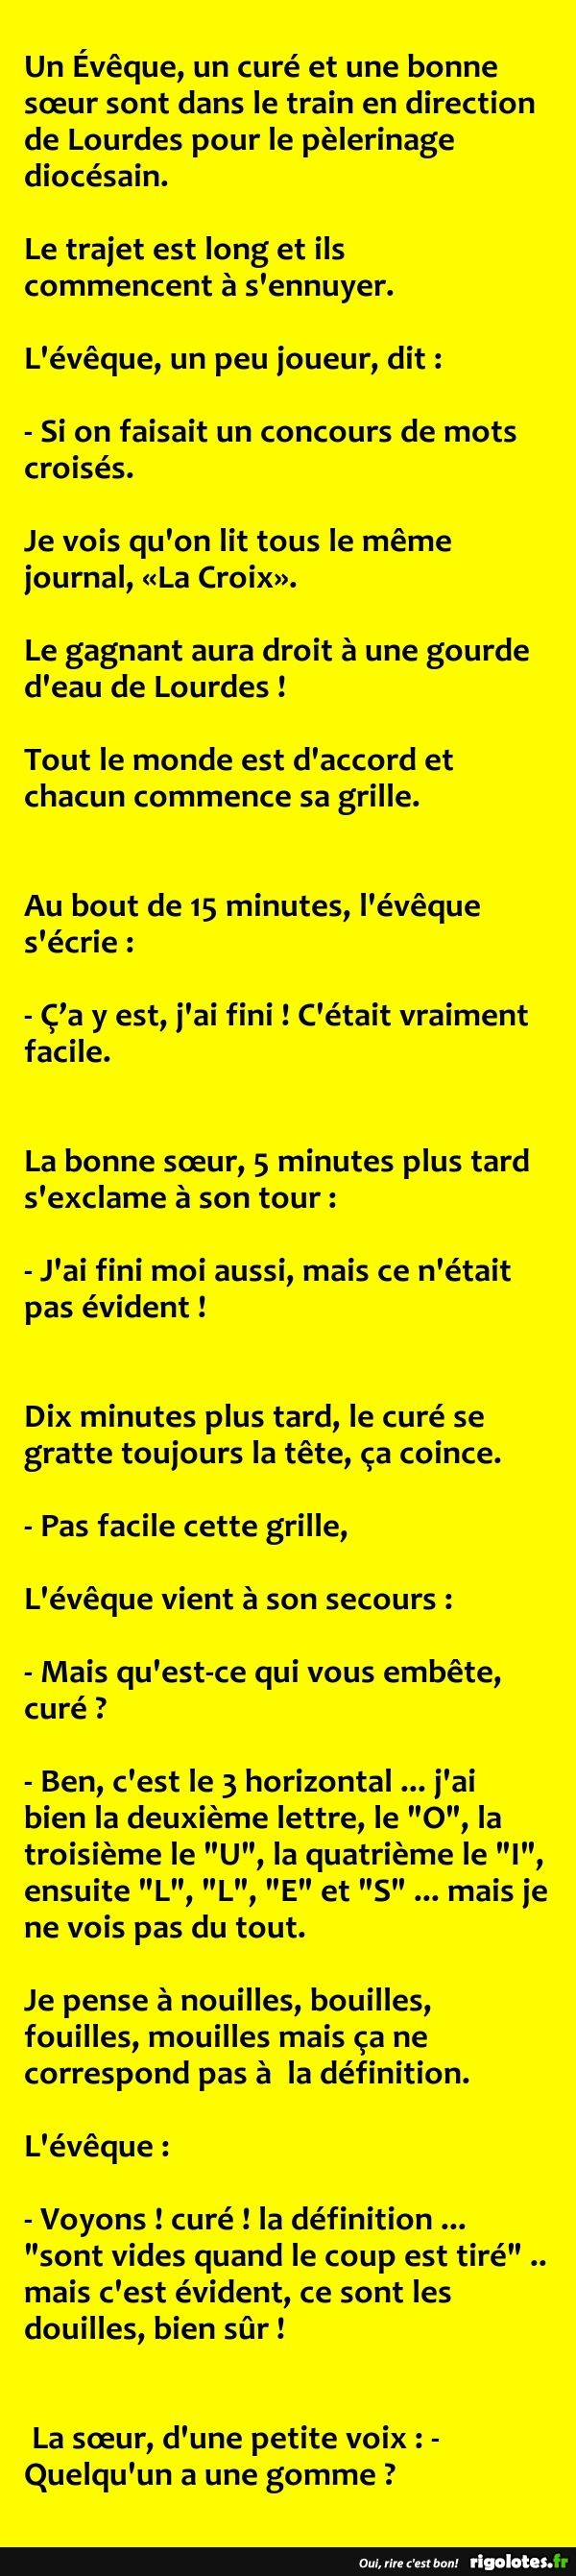 Un Évêque... - RIGOLOTES.fr